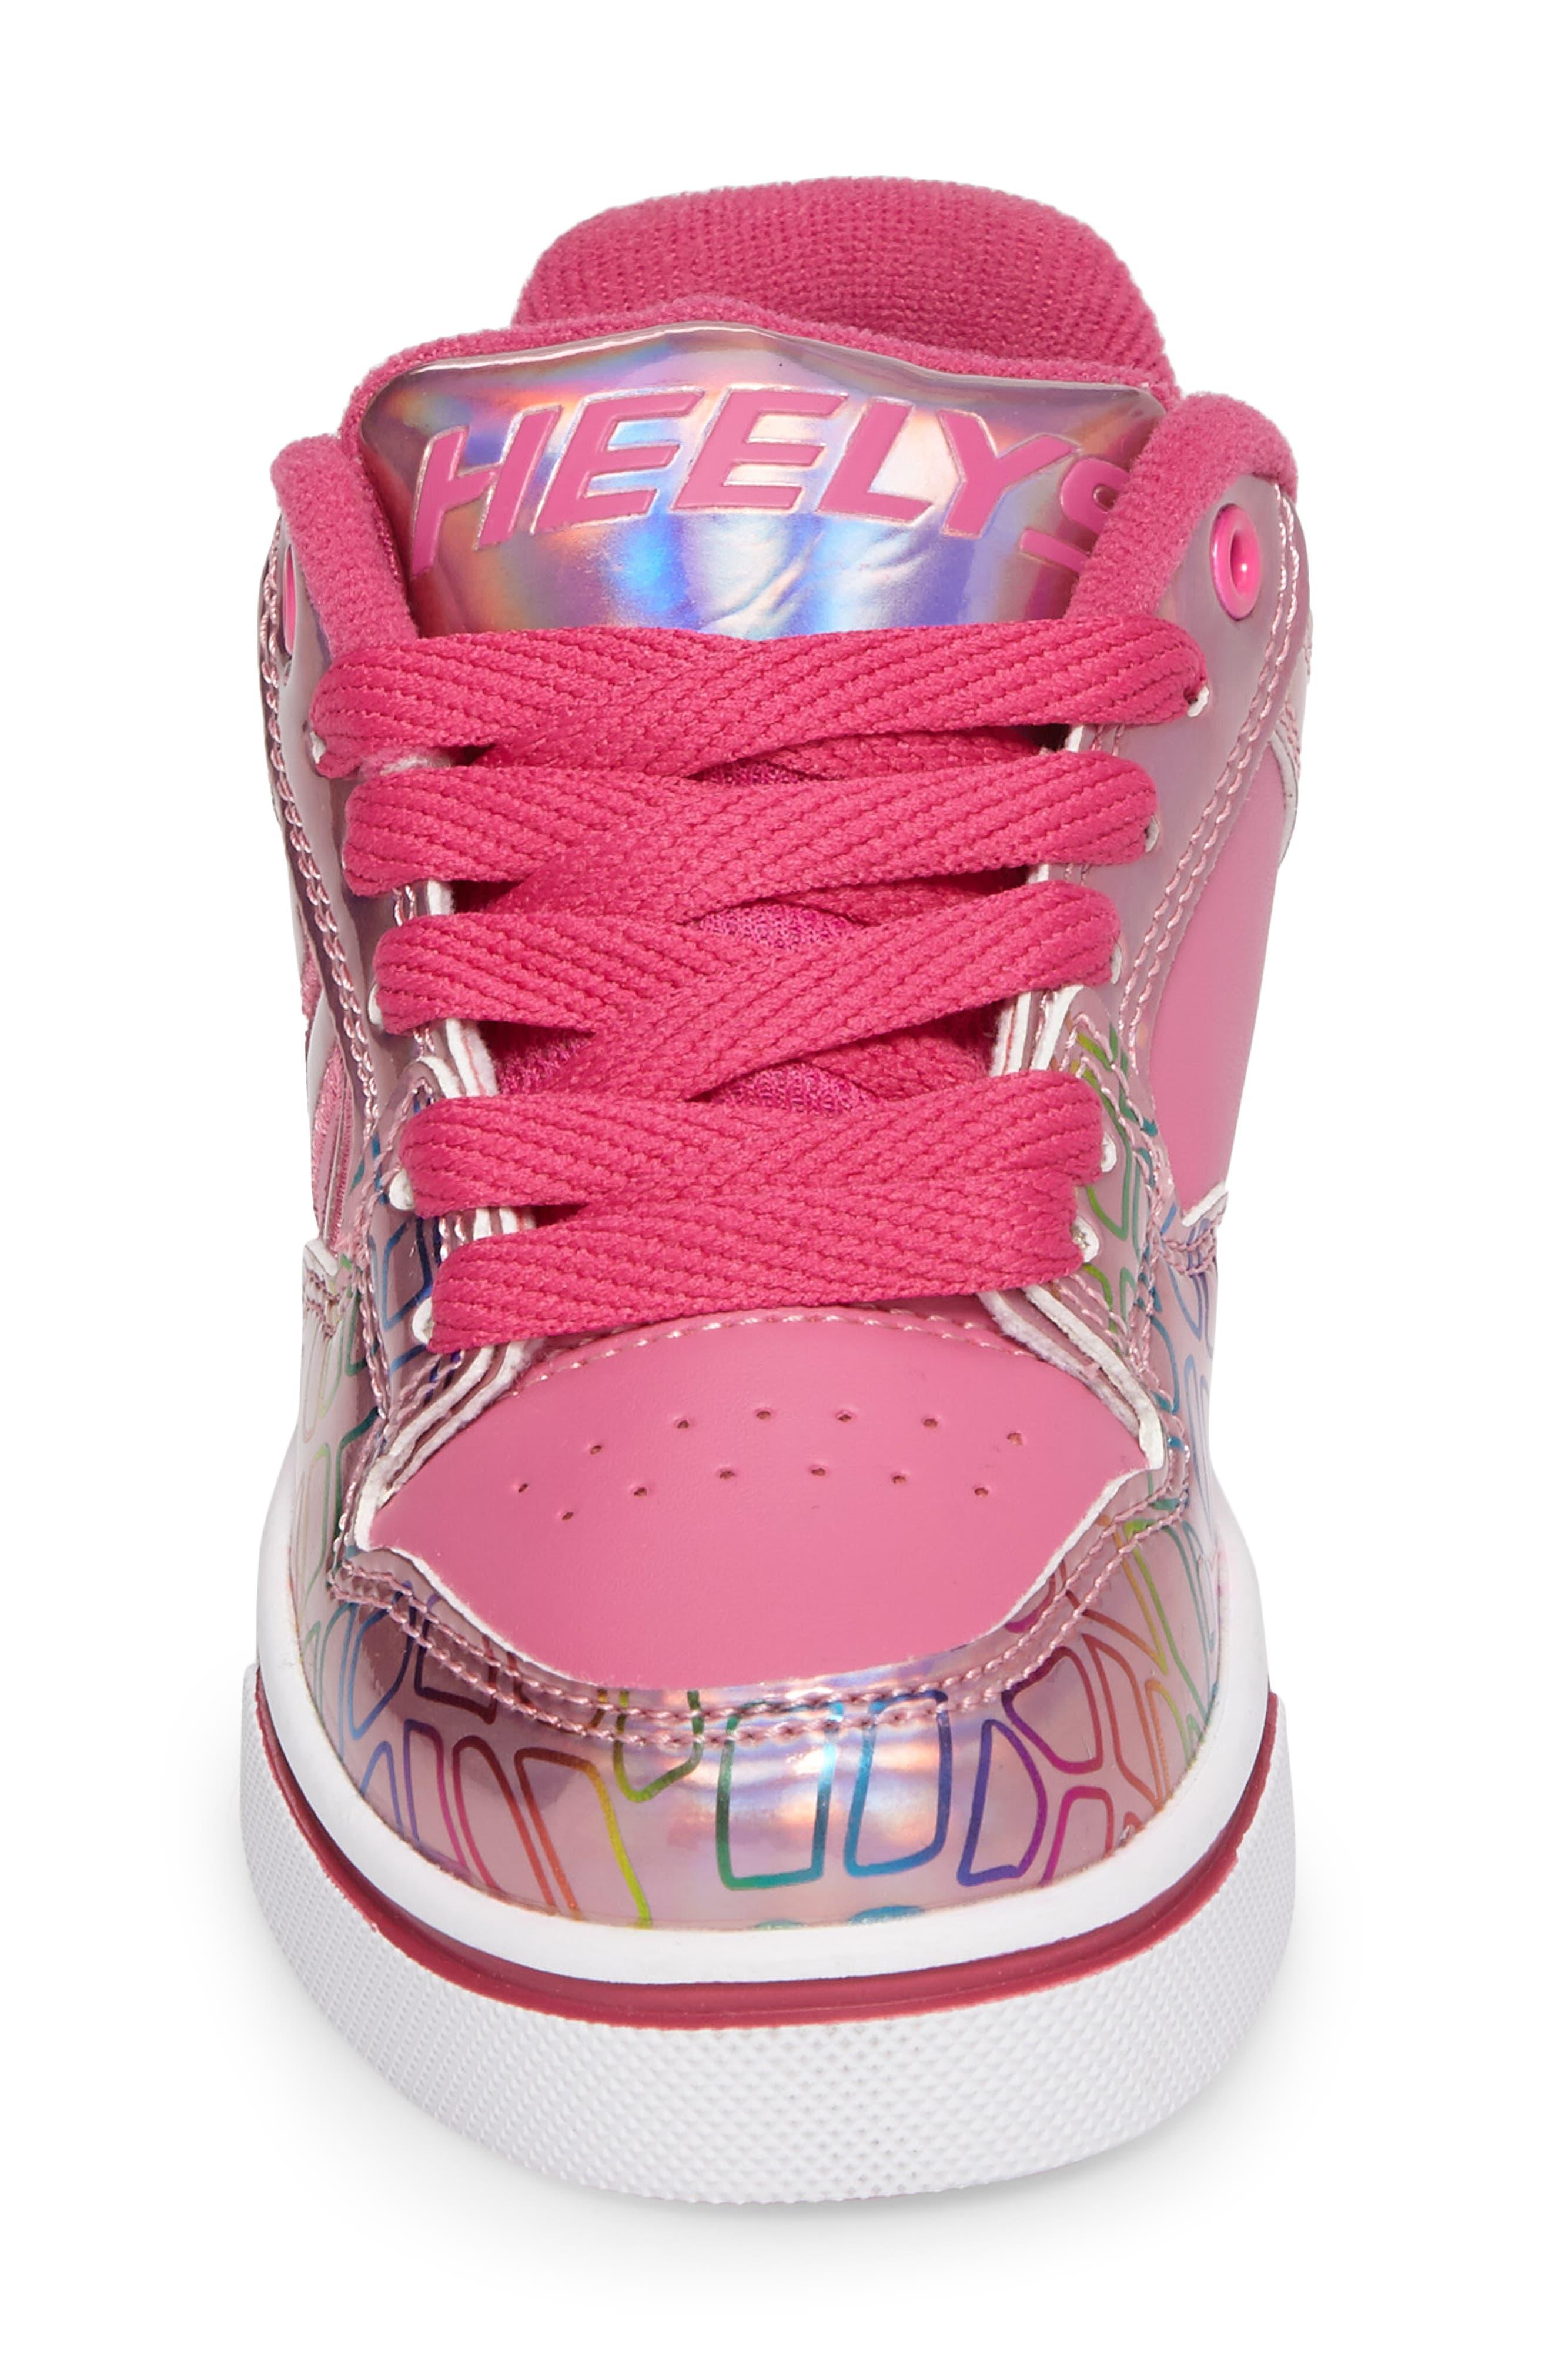 Motion Plus Skate Sneaker,                             Alternate thumbnail 4, color,                             PINK/ LIGHT PINK